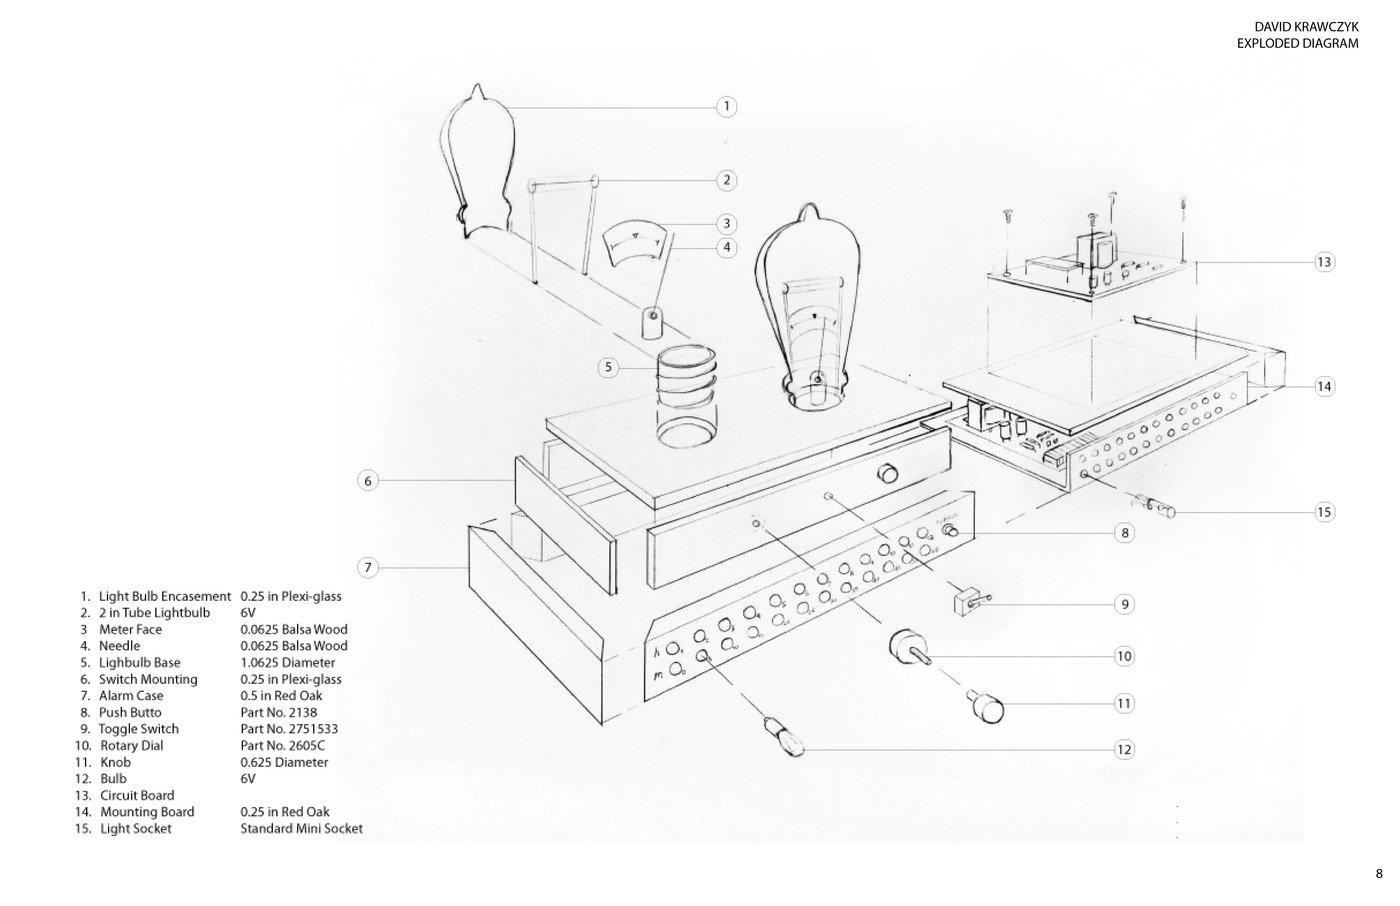 the edison alarm clock by david krawczyk at coroflot com